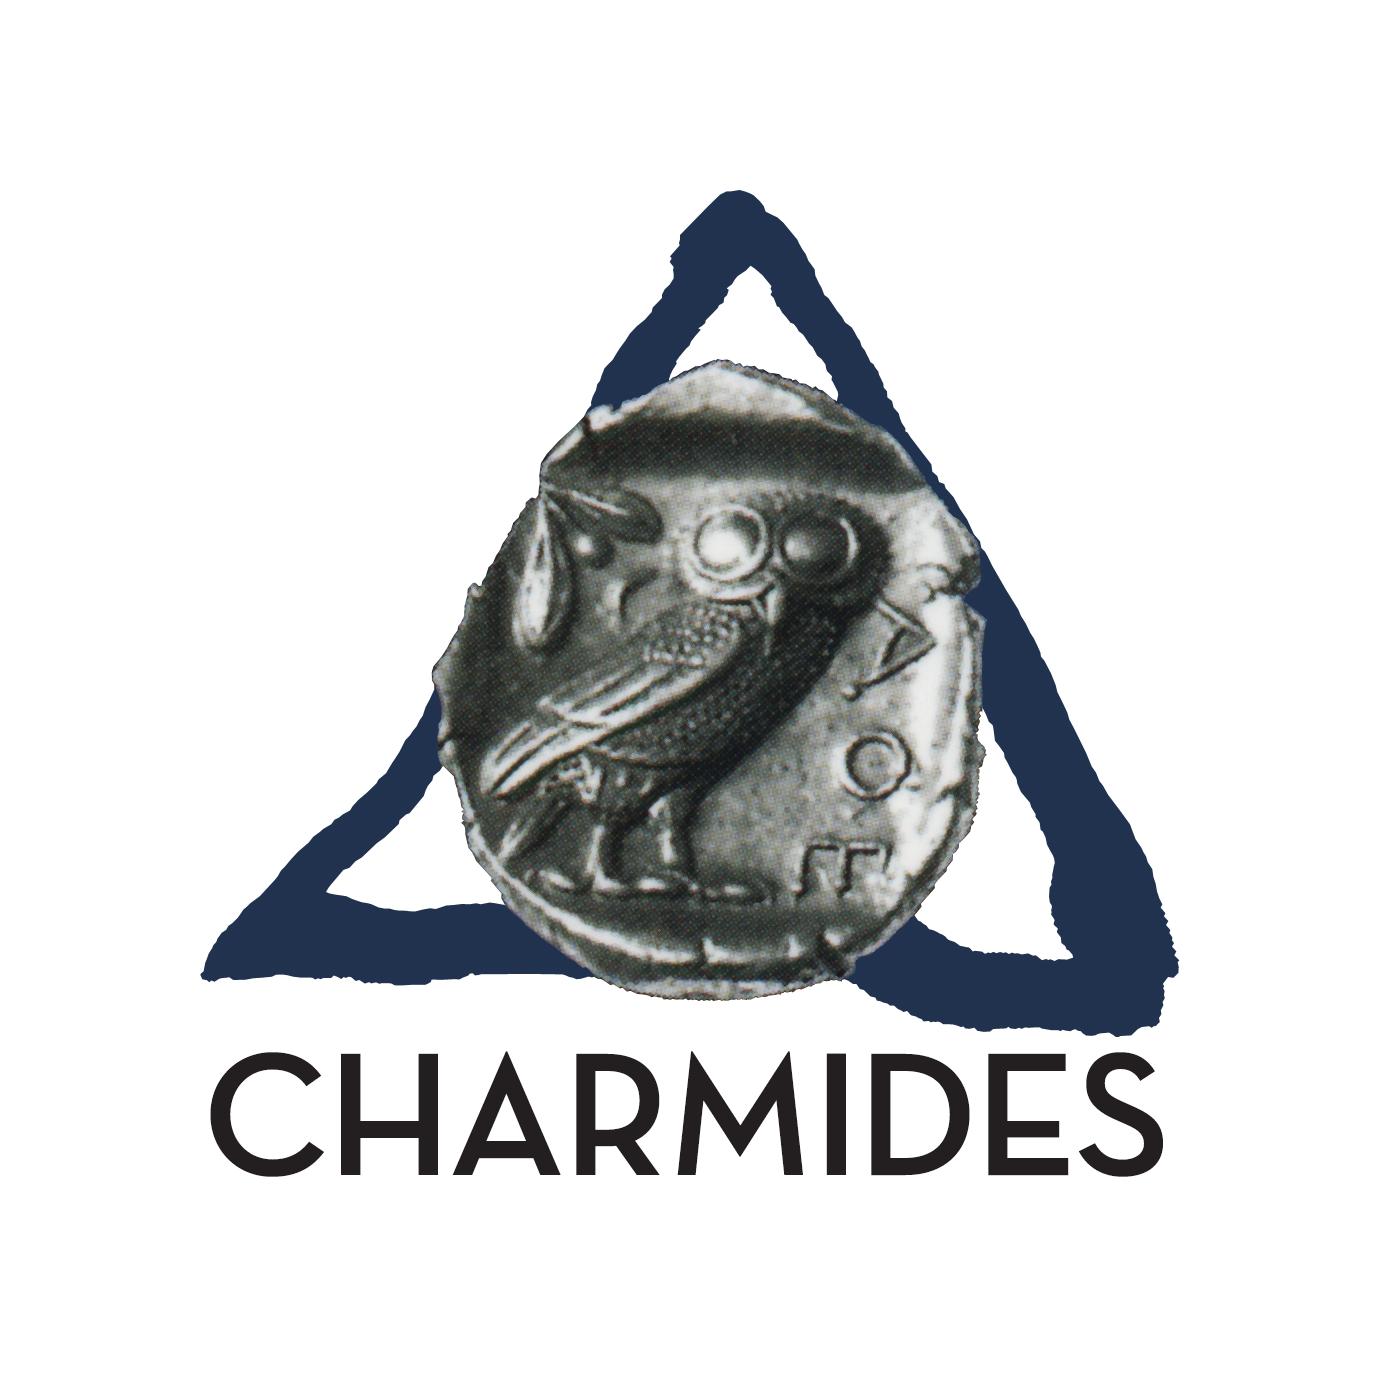 Editura Charmides